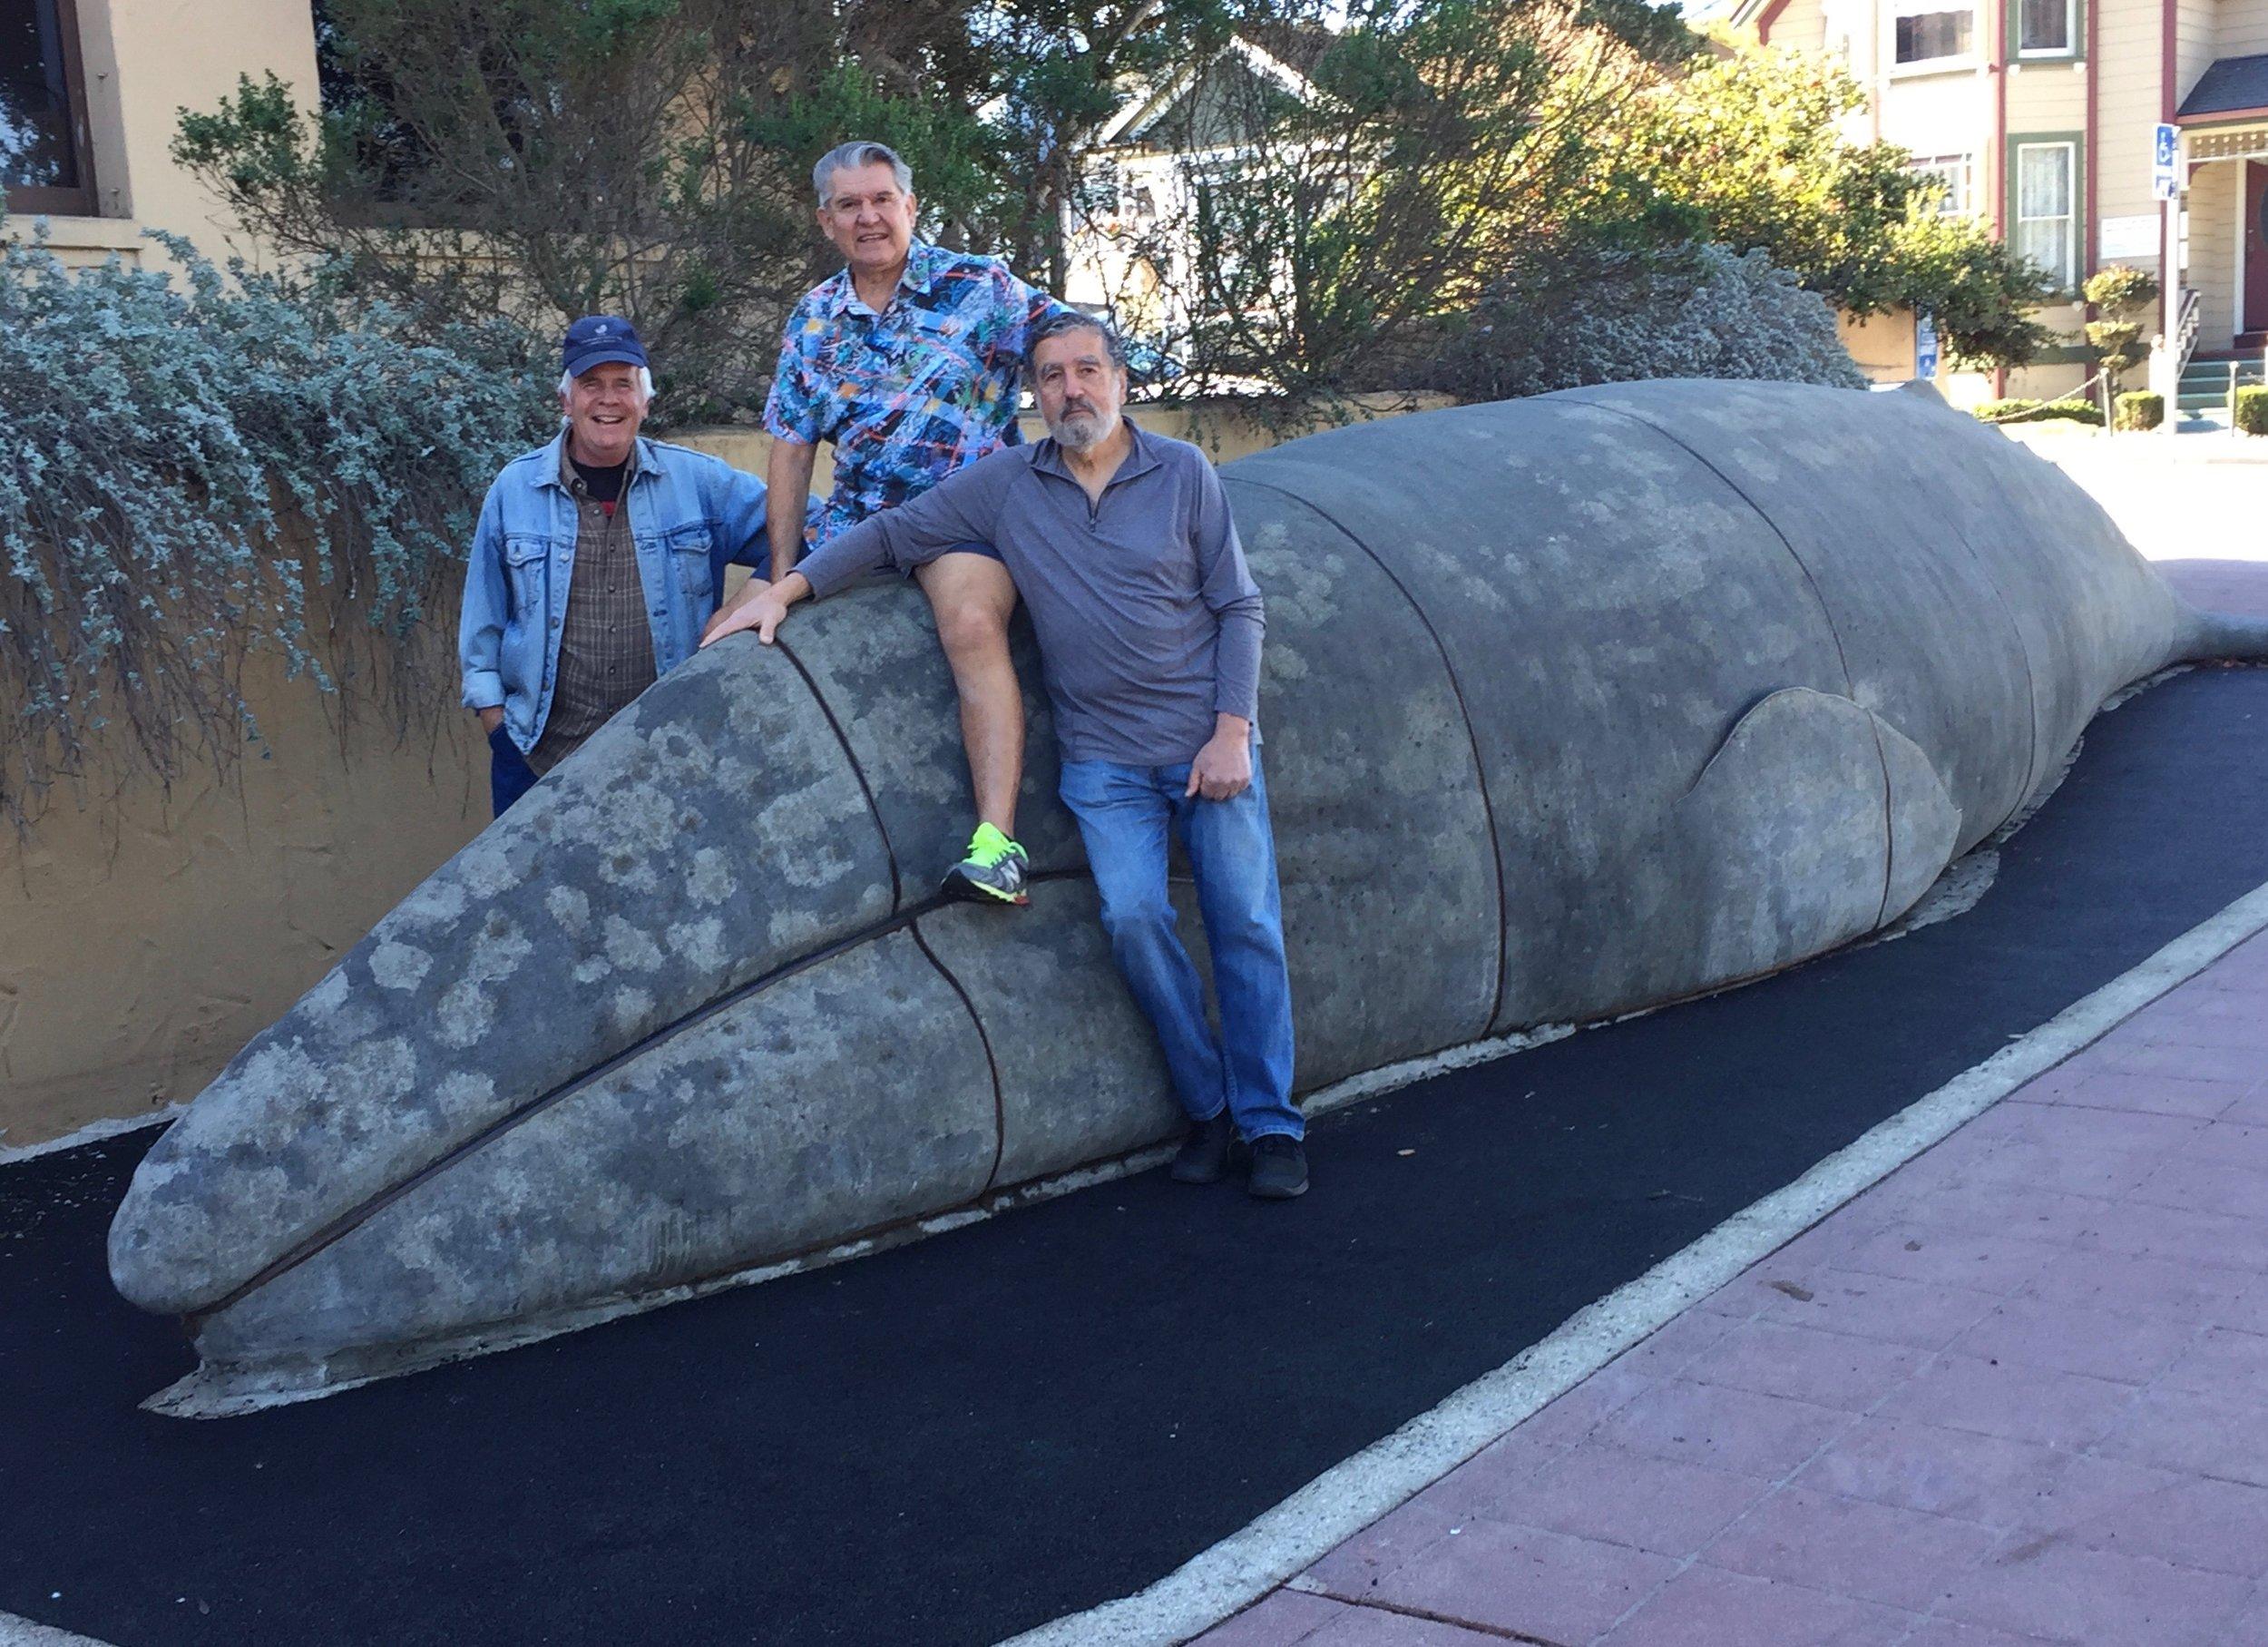 Paul Finnegan, Milos Radakovich and David Shonman - Whale Fund Campaign Team